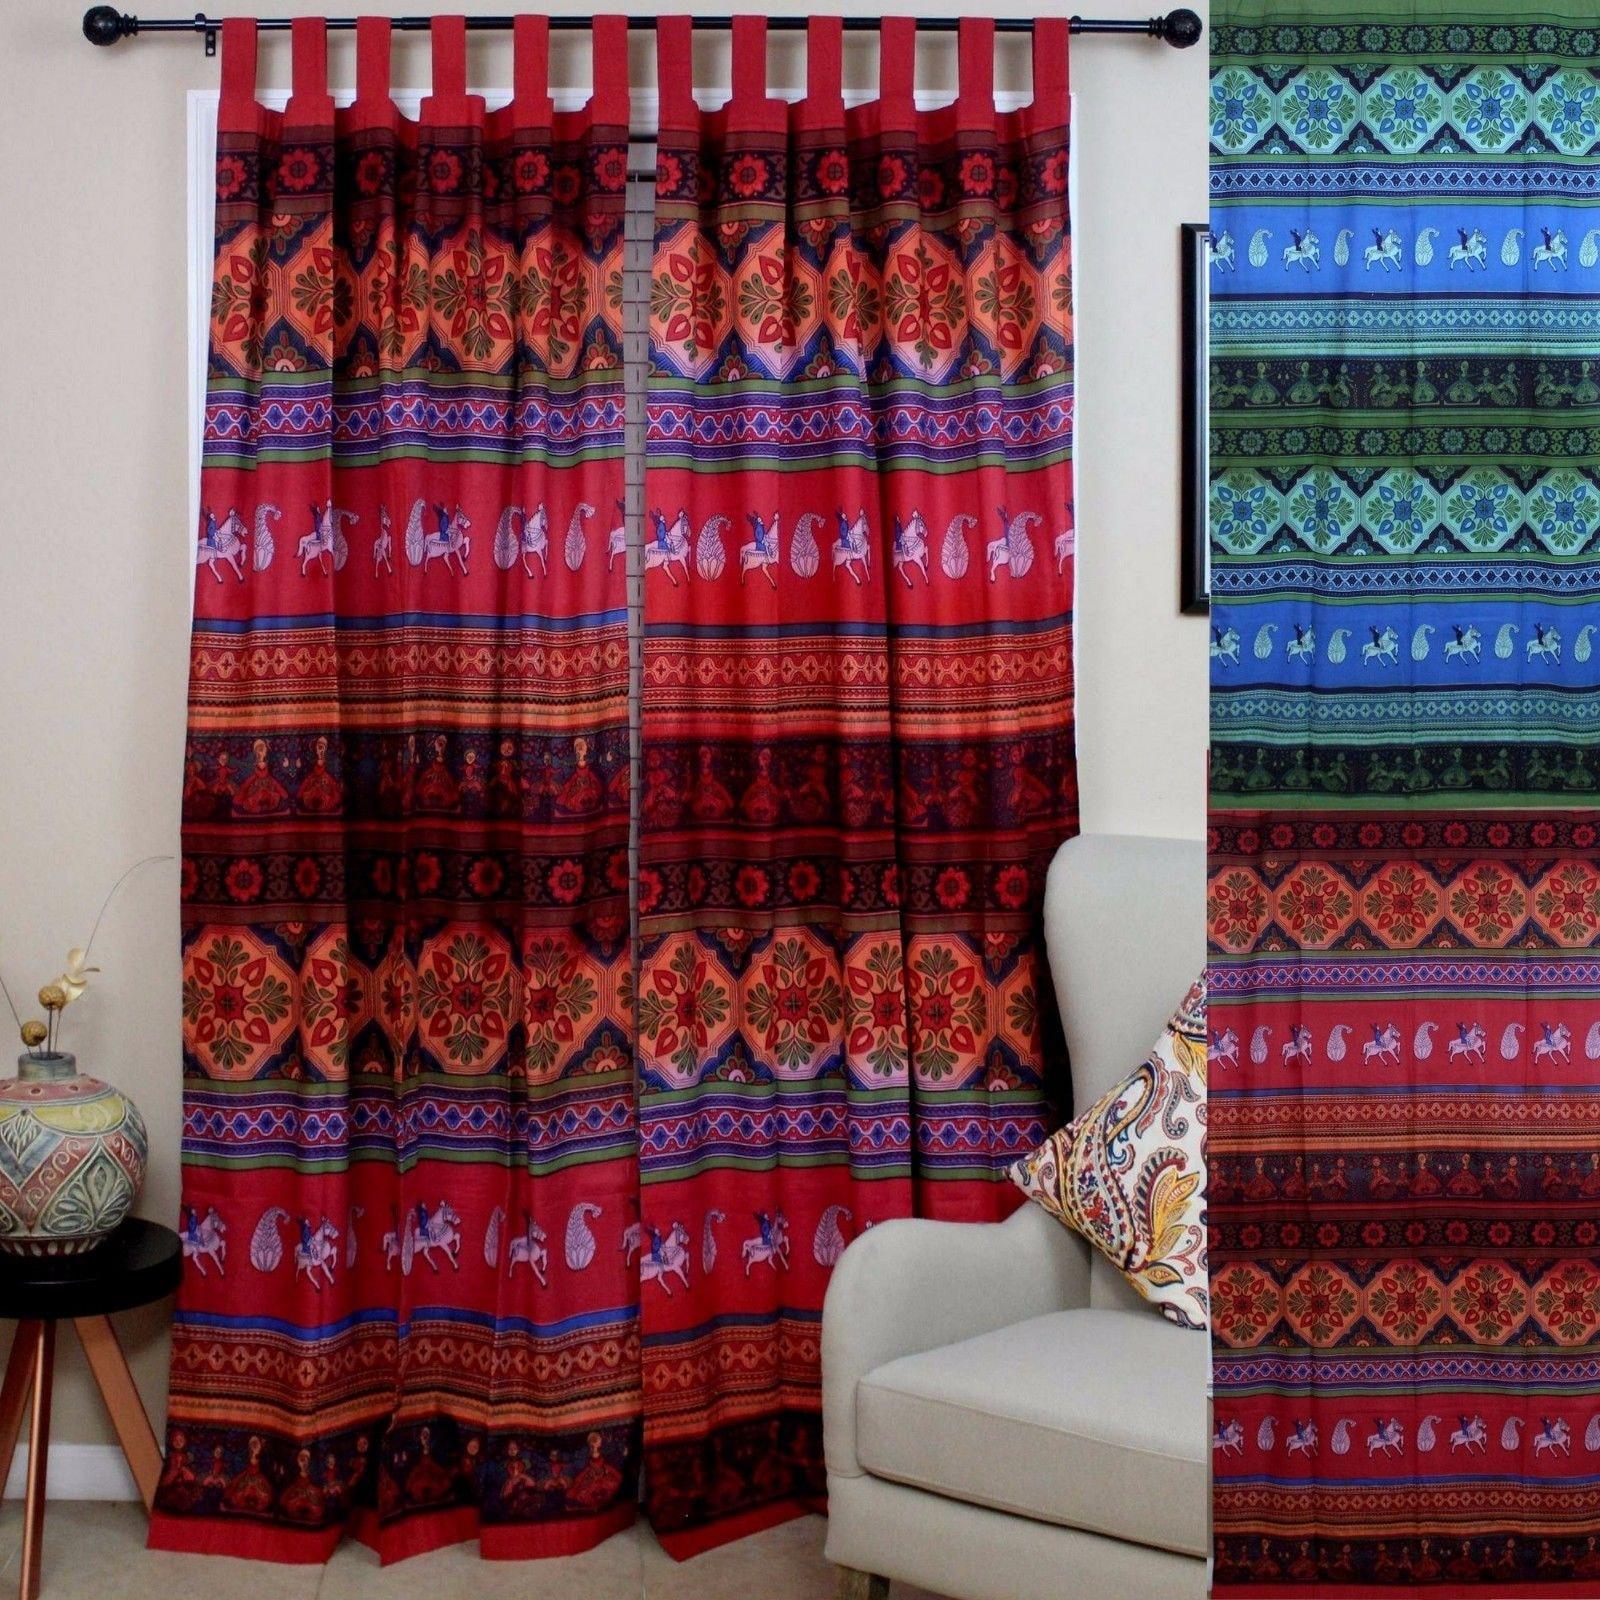 Handmade 100% Cotton Kalamkari Floral Tie Dye Tab Top Curtain Drape Panel - Red & Blue Green - 44 x 88 inches - Thumbnail 0